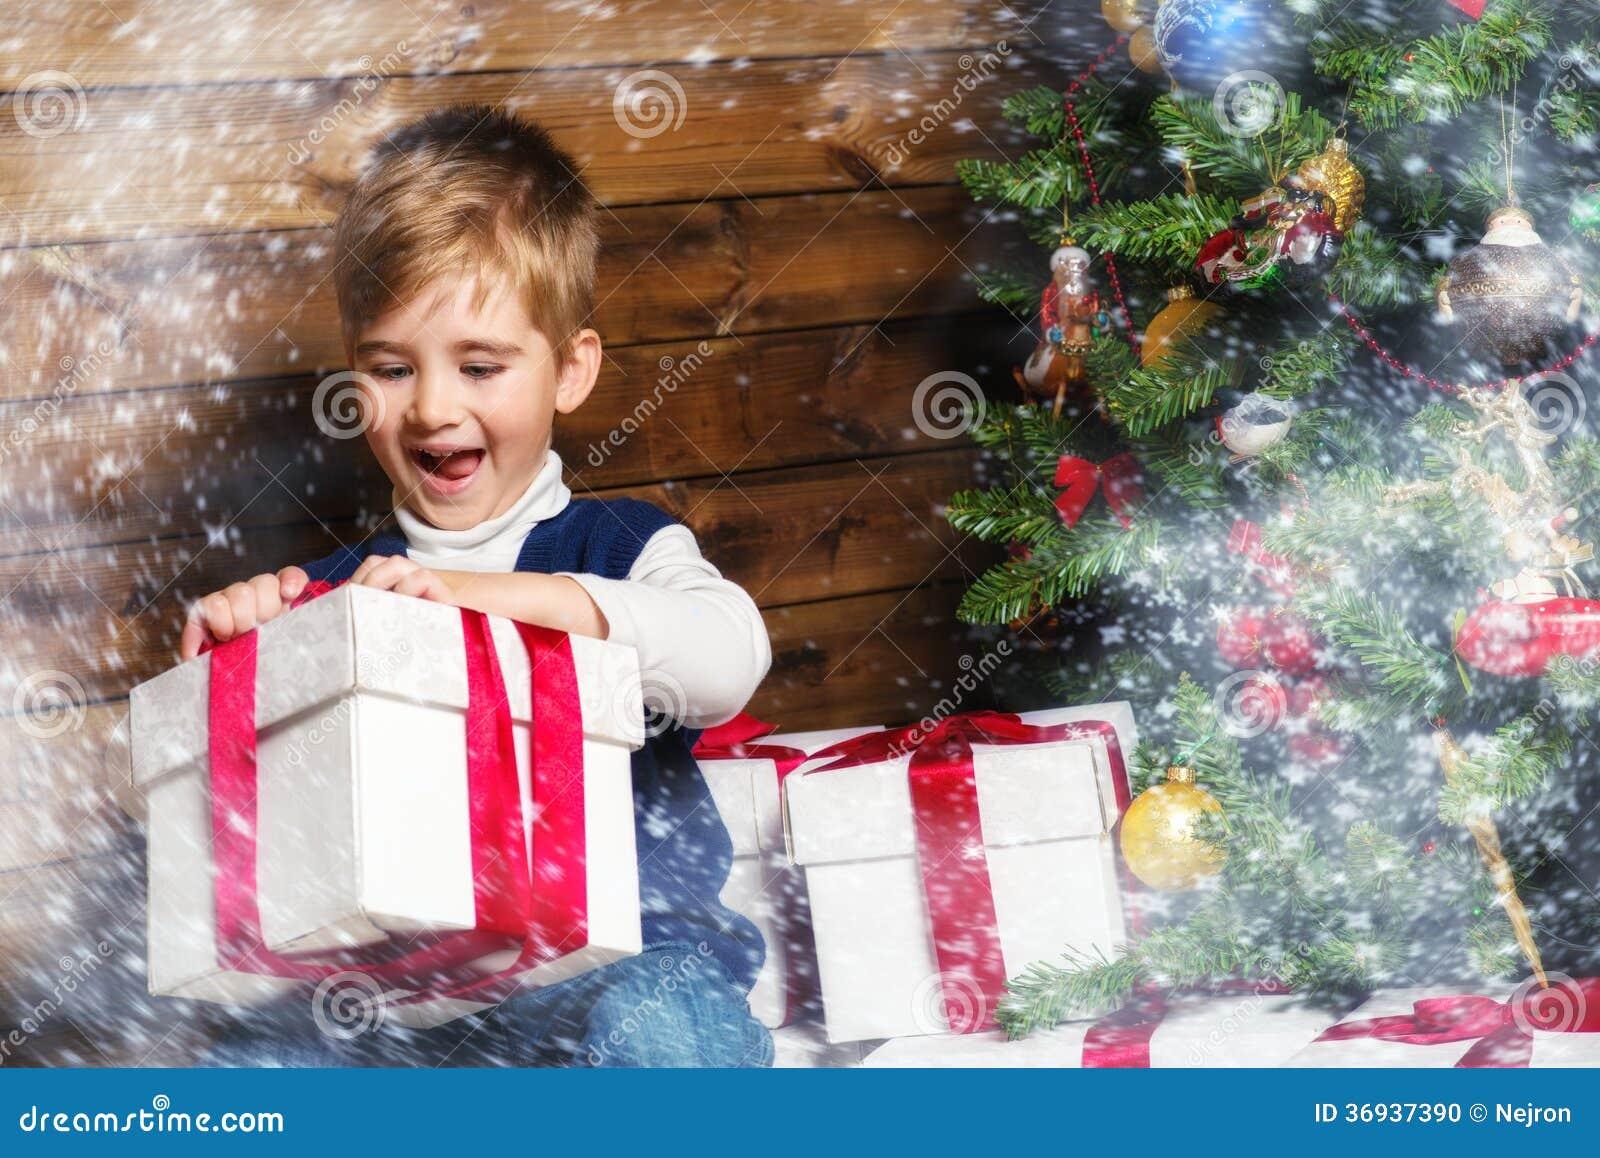 Liitle Boy Opening Gift Box Stock Photo Image Of Open